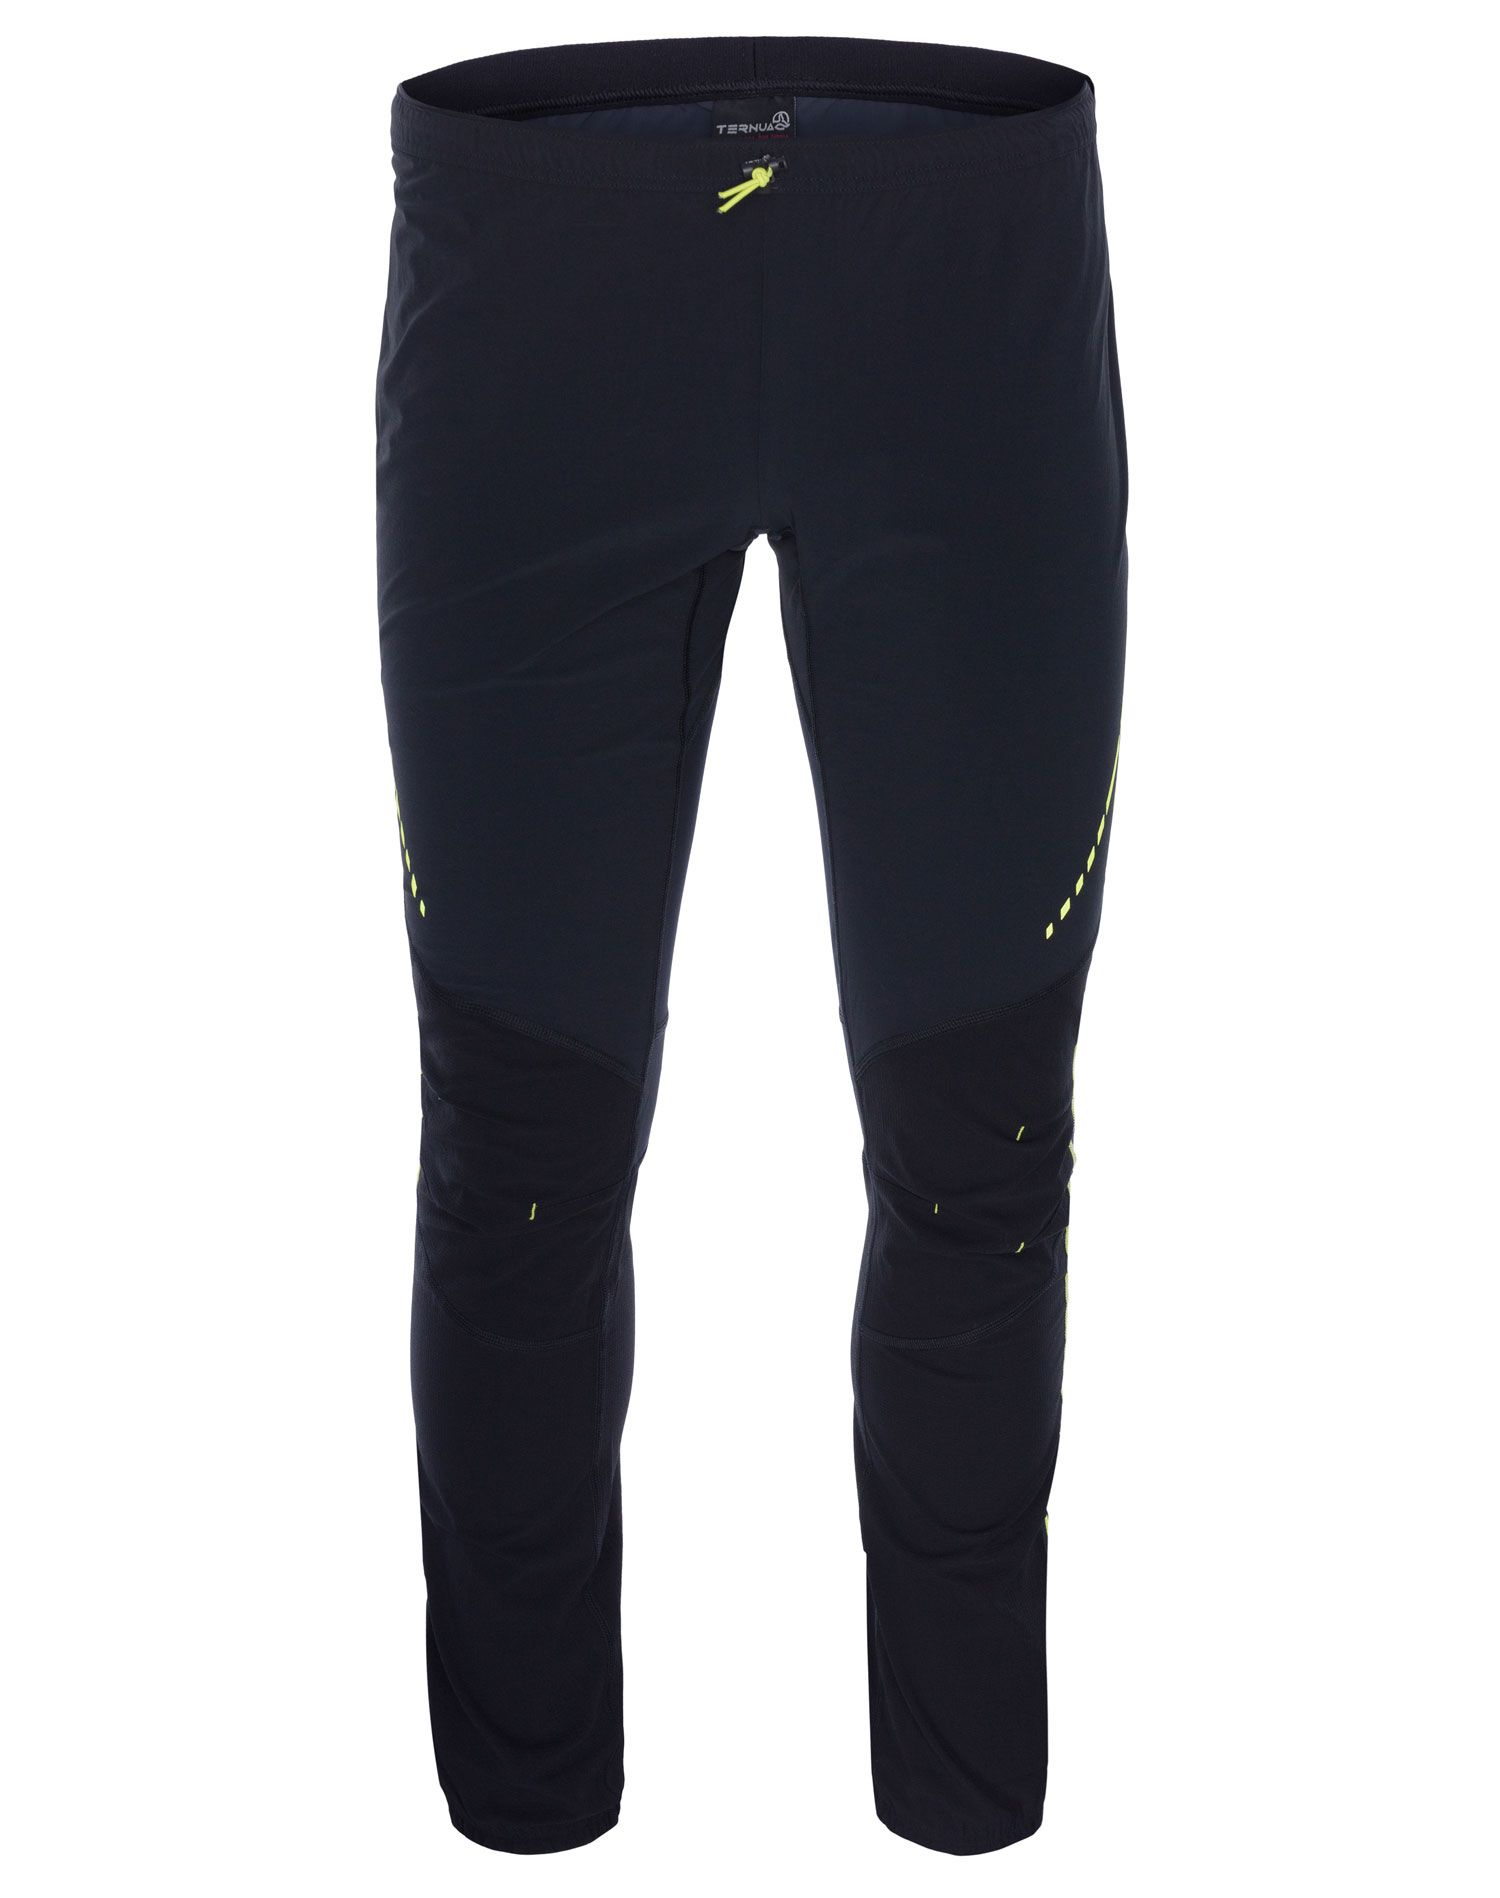 Ternua Stowe Pant - Pantalon homme